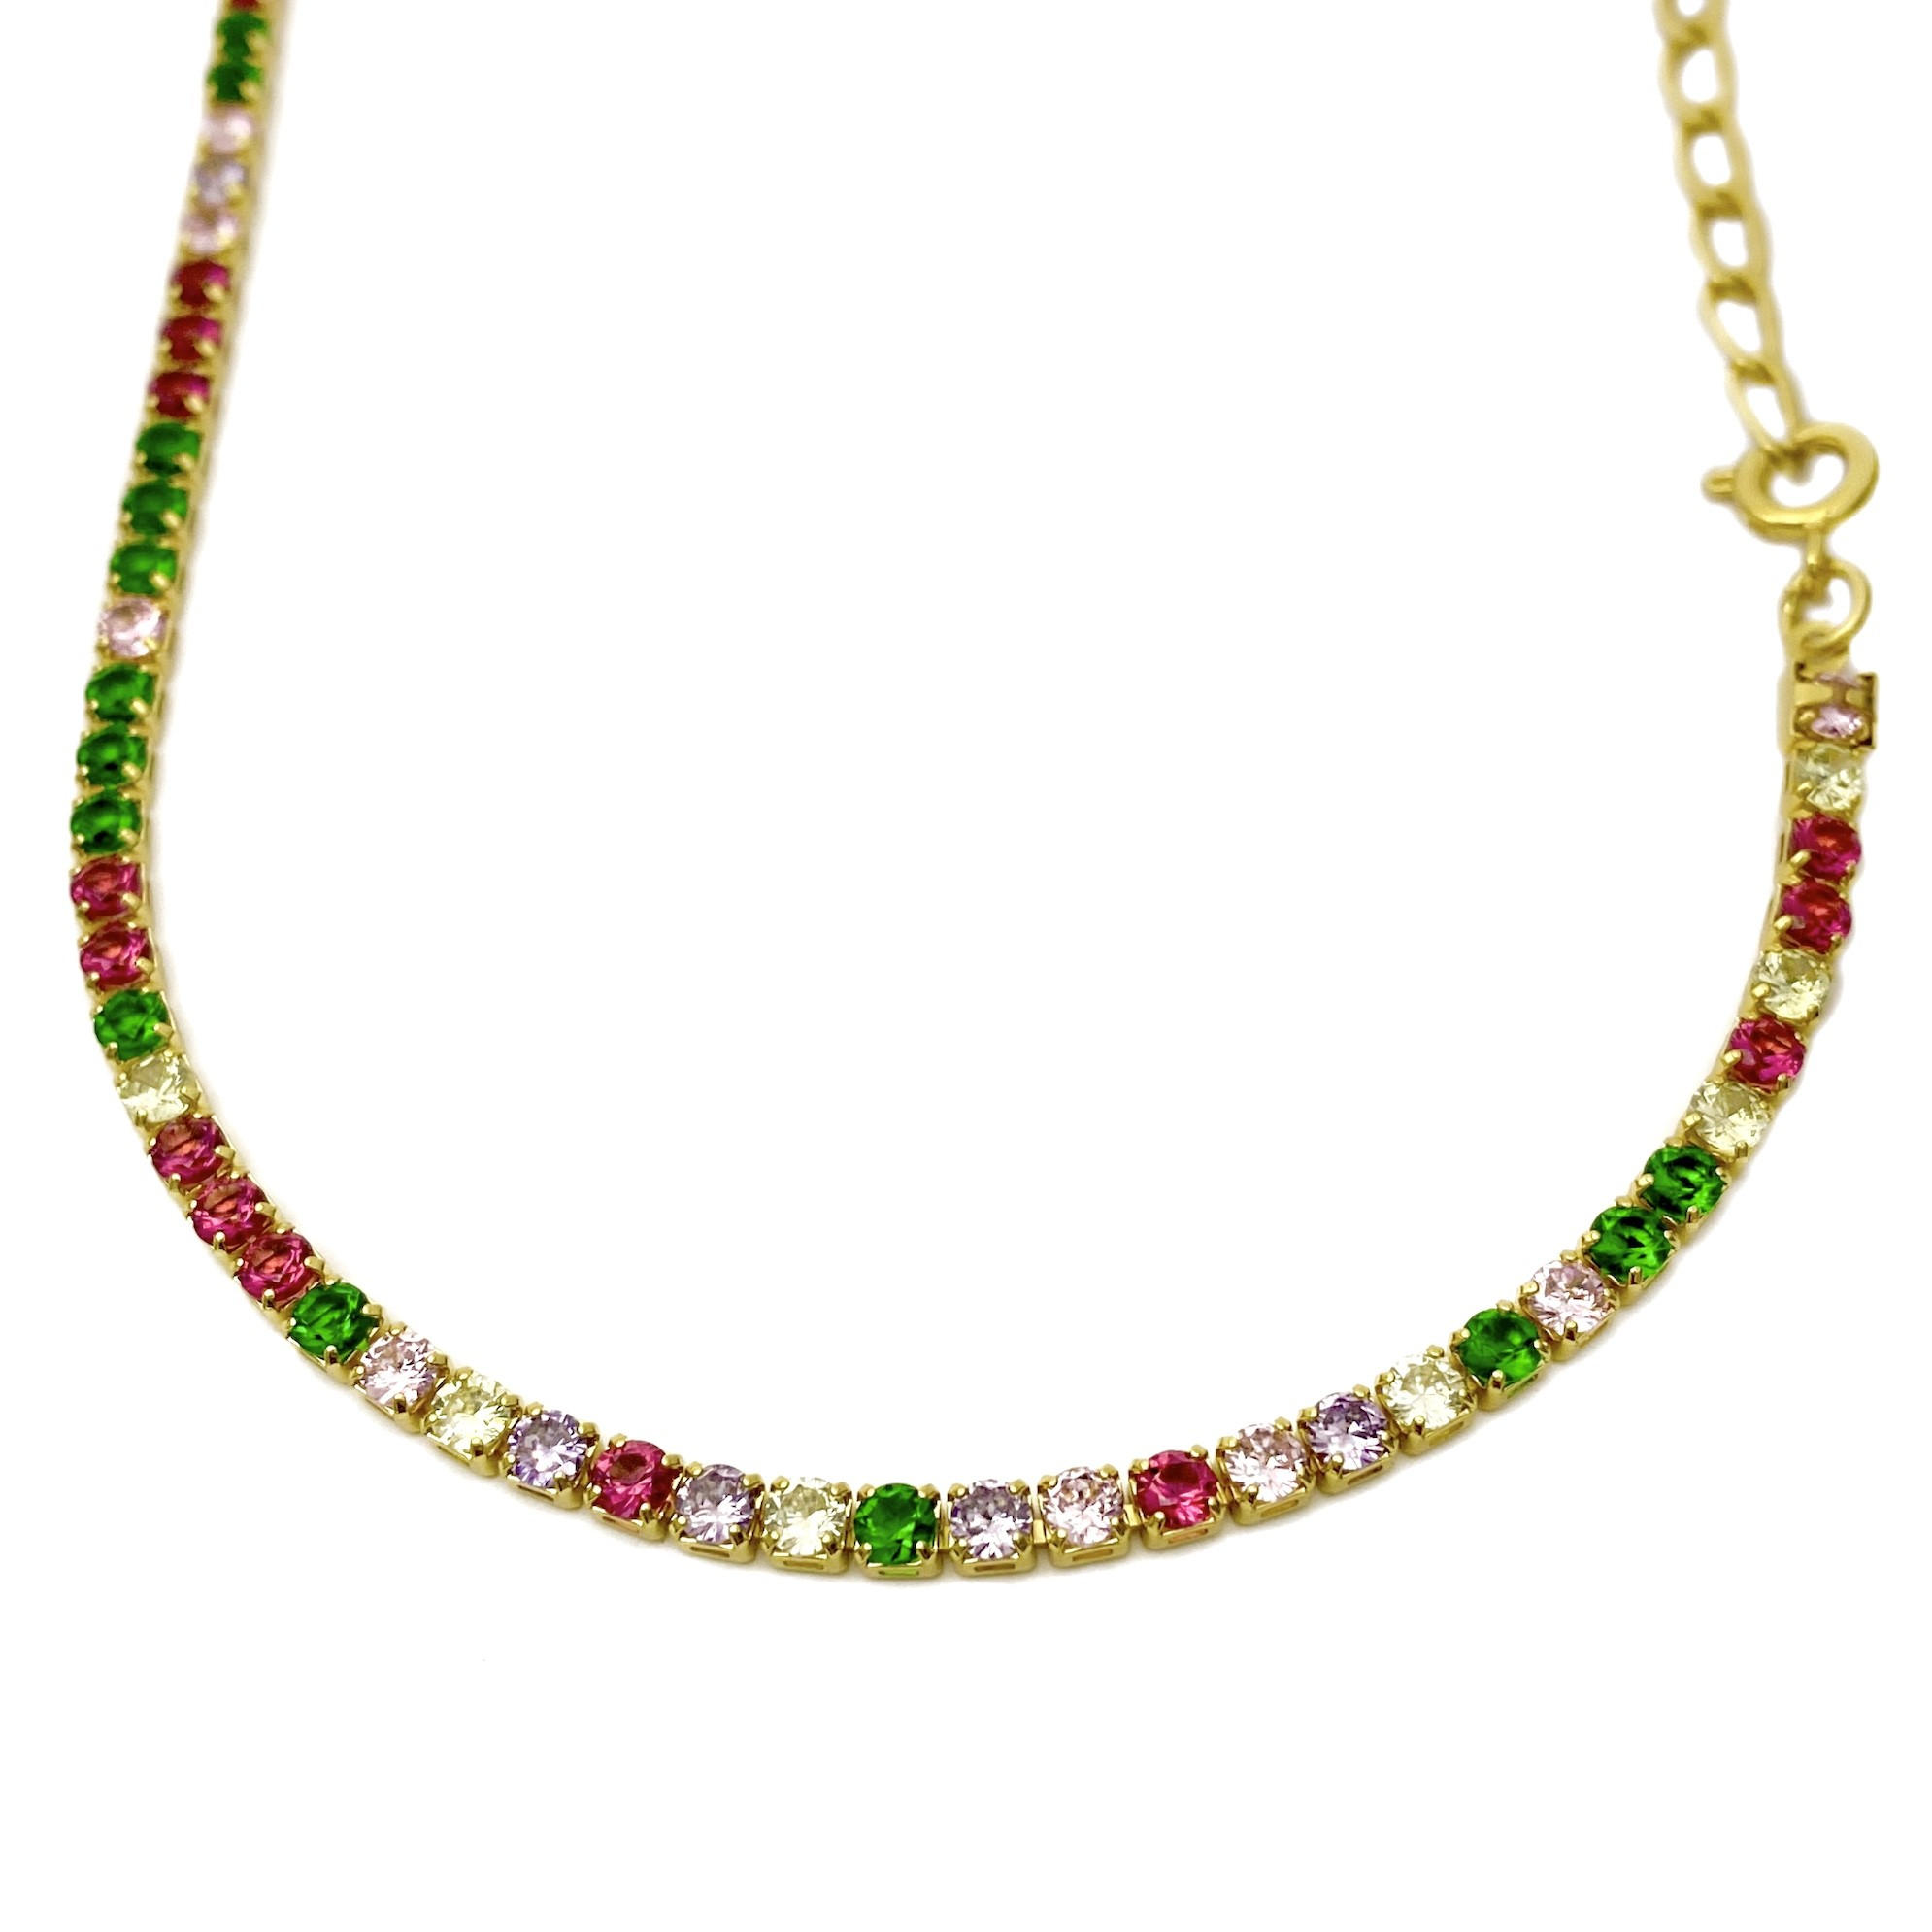 Choker Riviera Tennis Chain Pedras de Zircônia Colors 3mm Fecho Tradicional (Banho Ouro 24K)